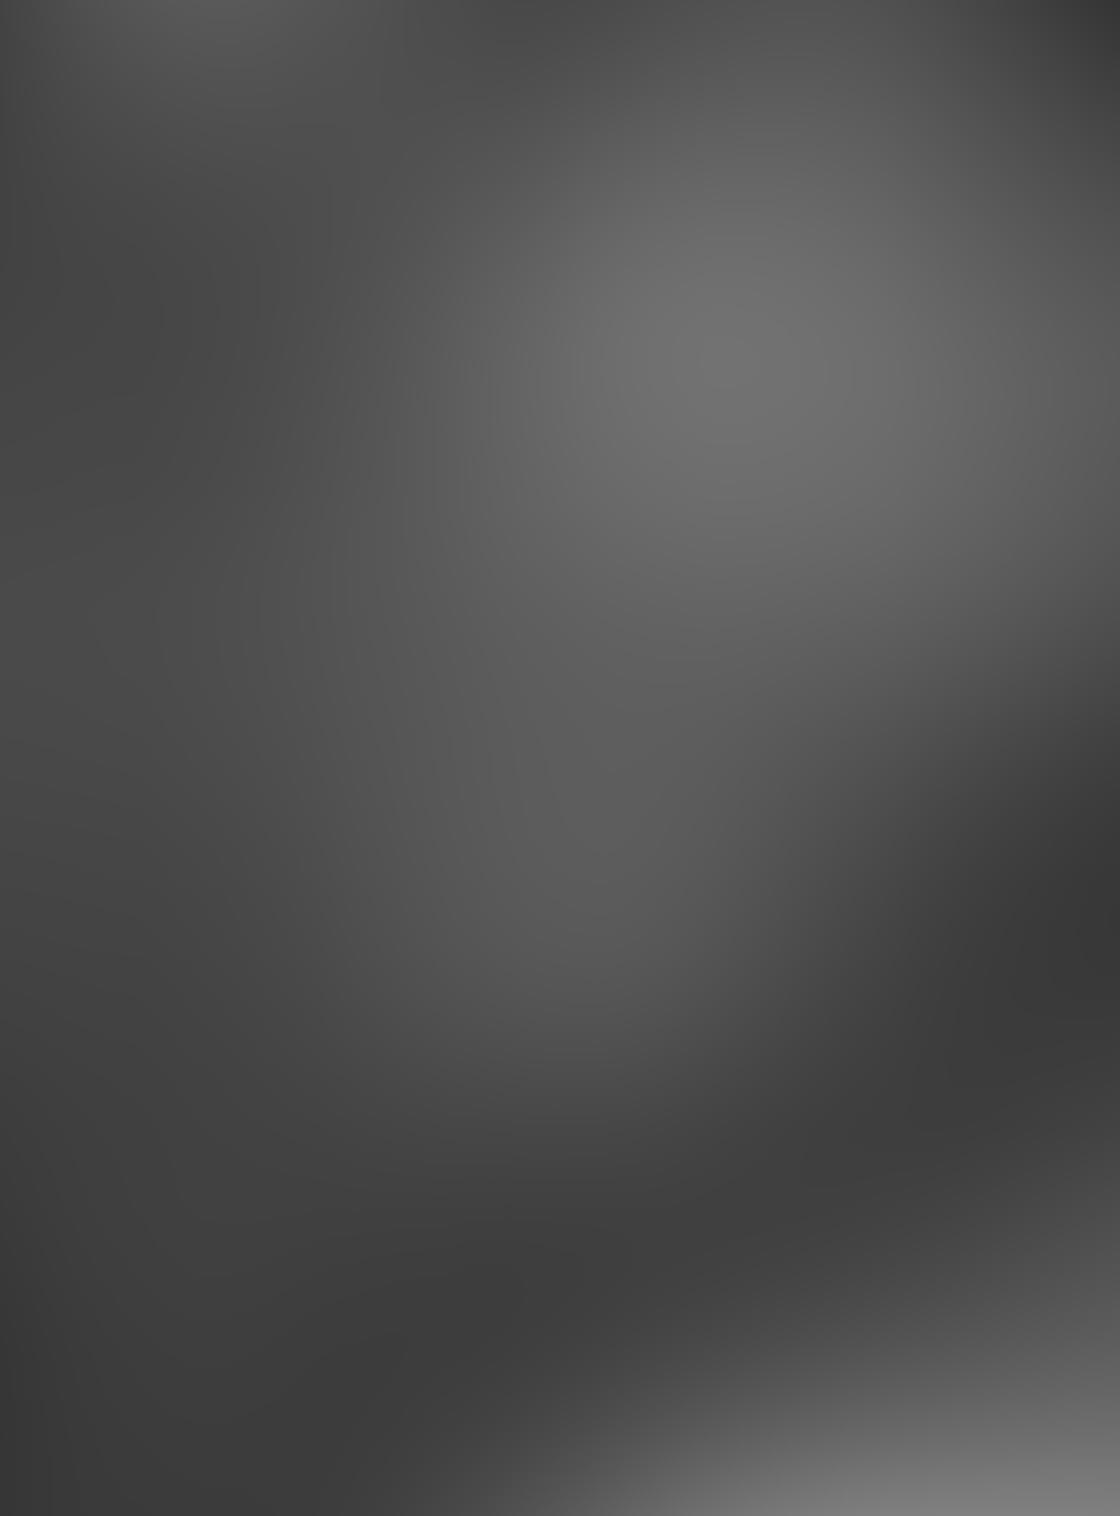 iPhone Photo Shadows 6